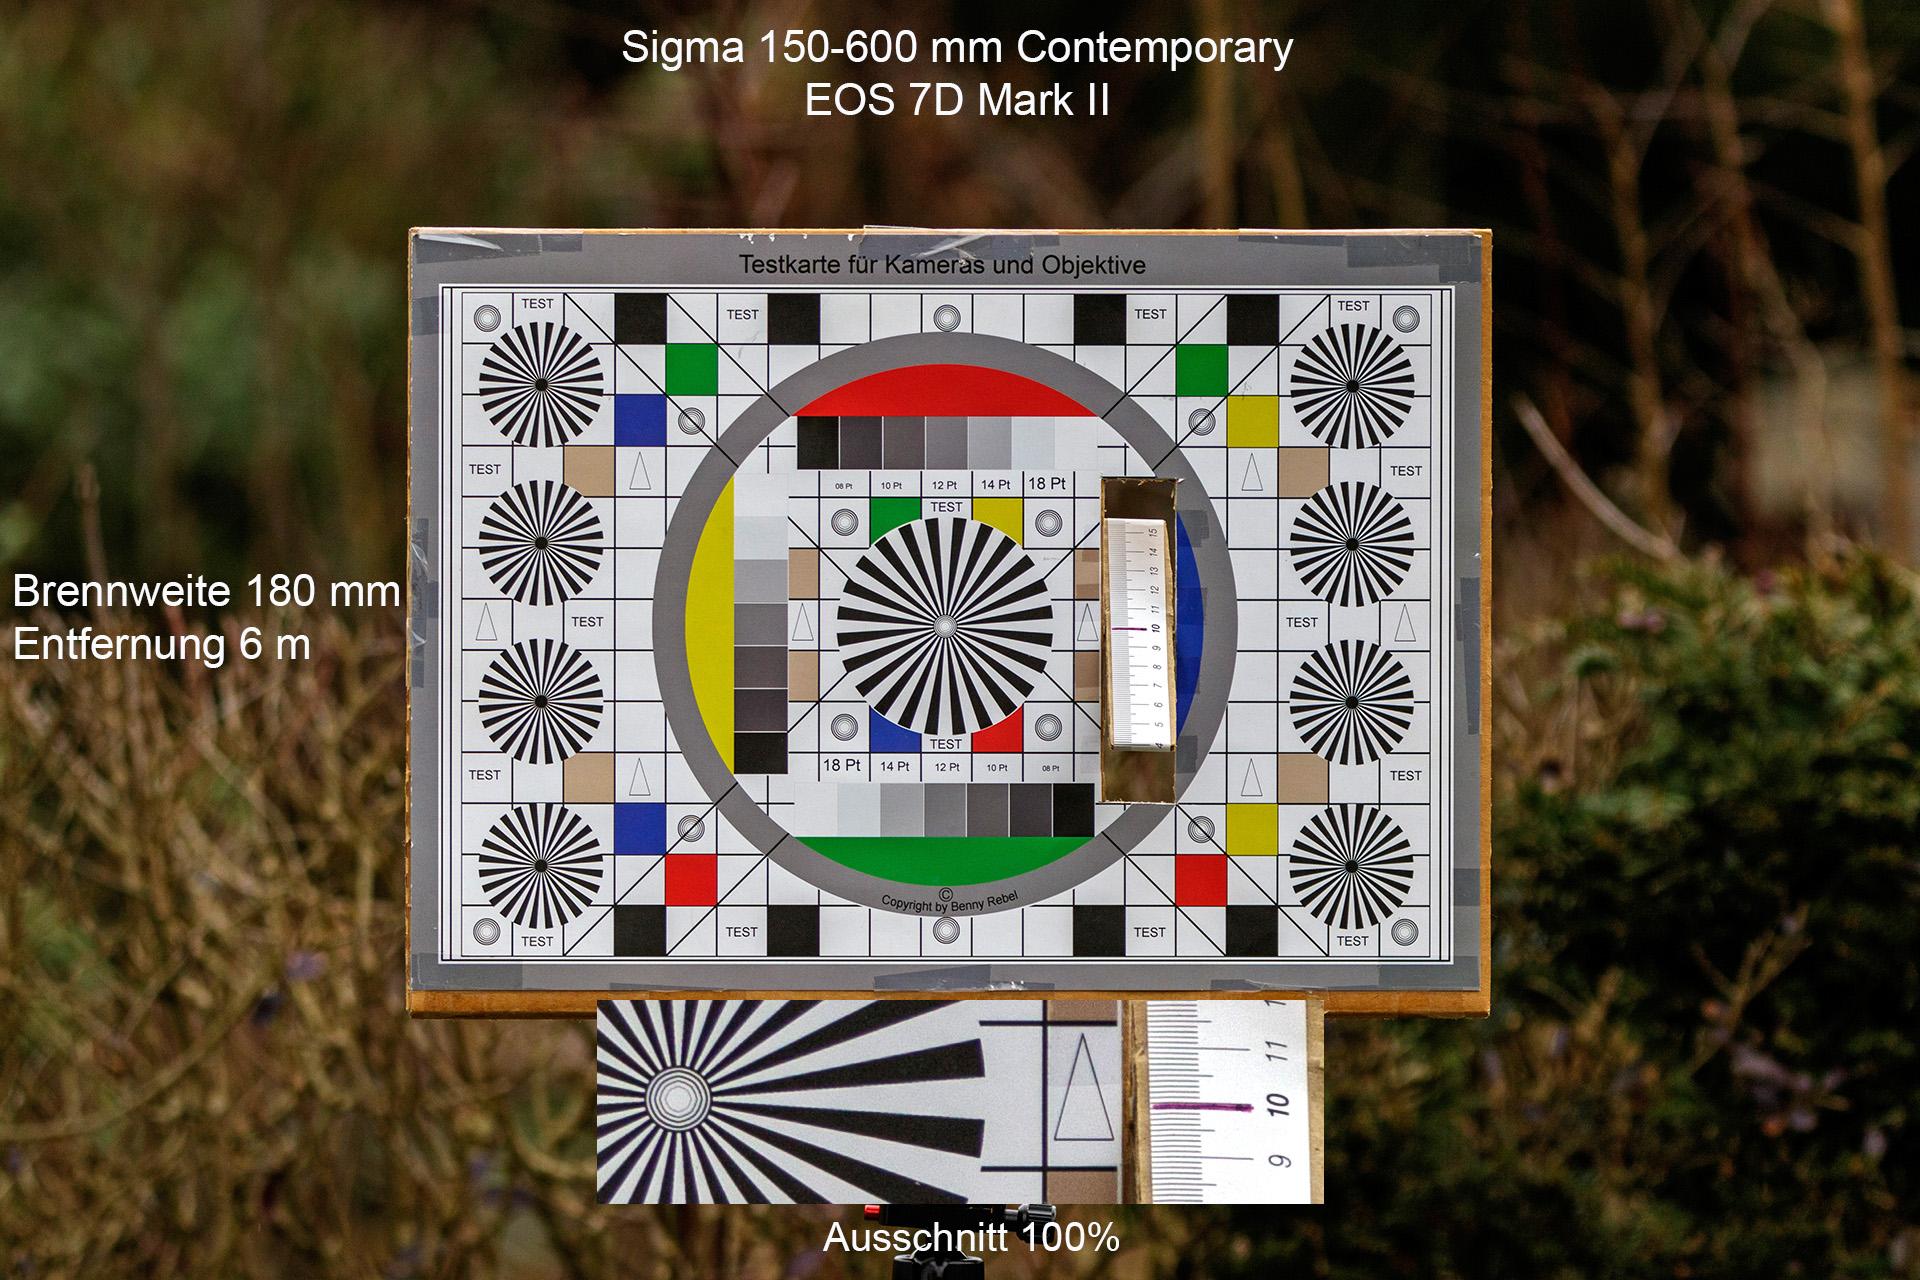 Testaufnahmen, Sigma 150-600 mm, 7D Mark II, 6 Meter, 180 mm